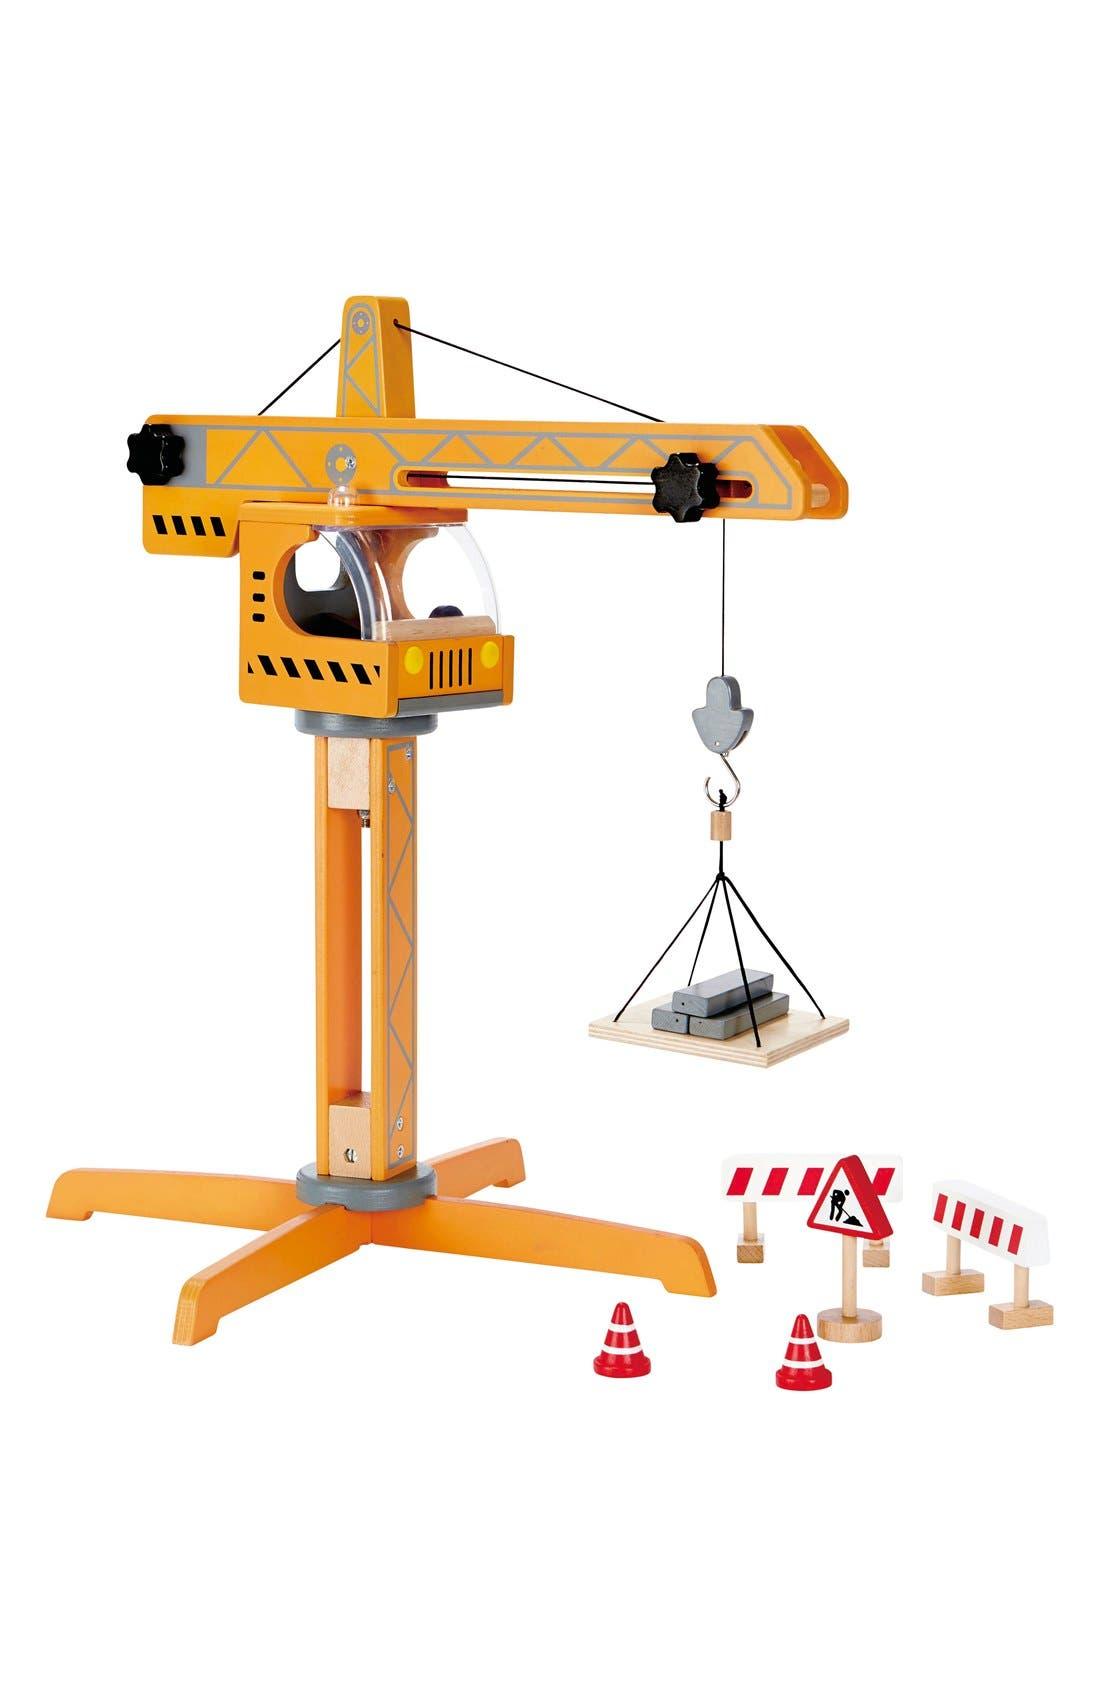 Alternate Image 1 Selected - Hape Crane Lift Toy